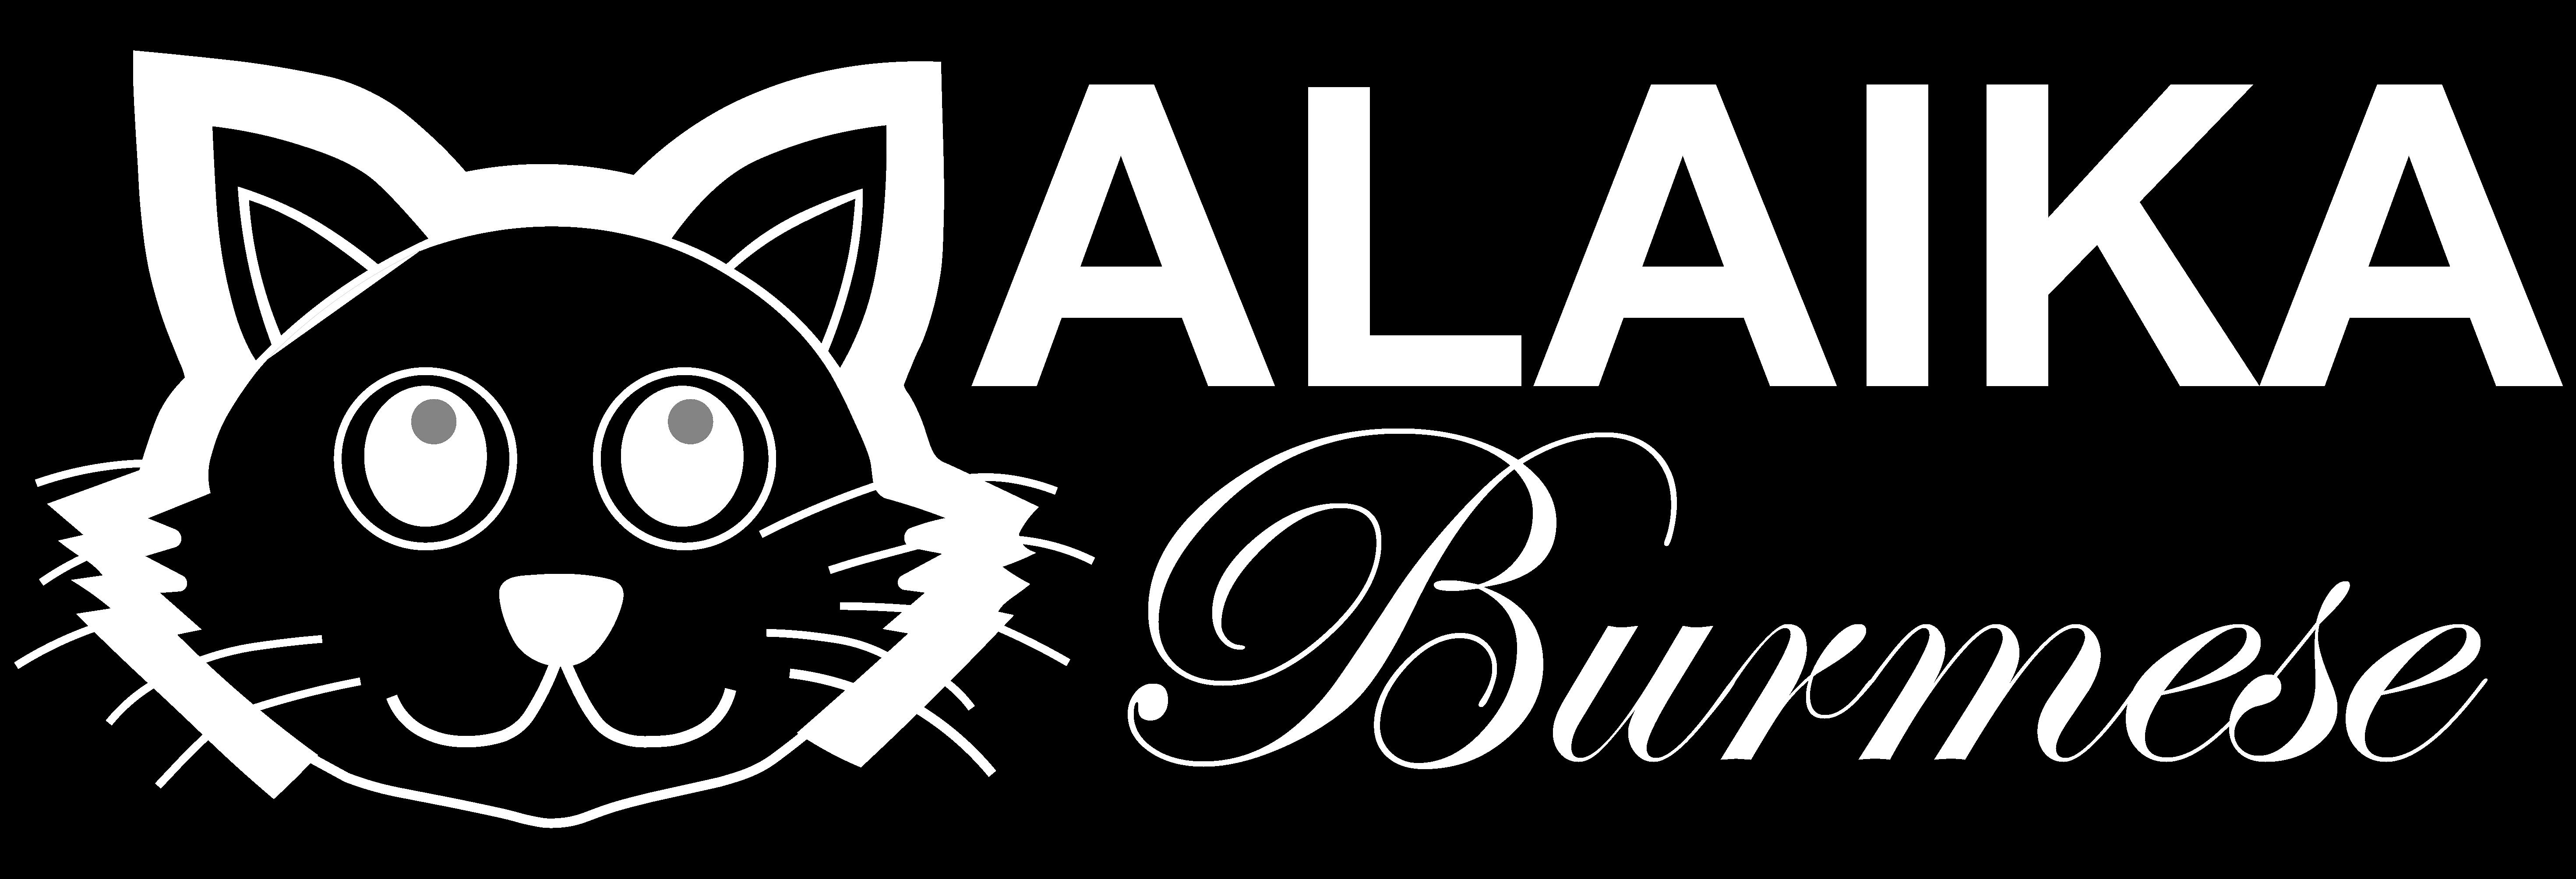 Malaika Burmese